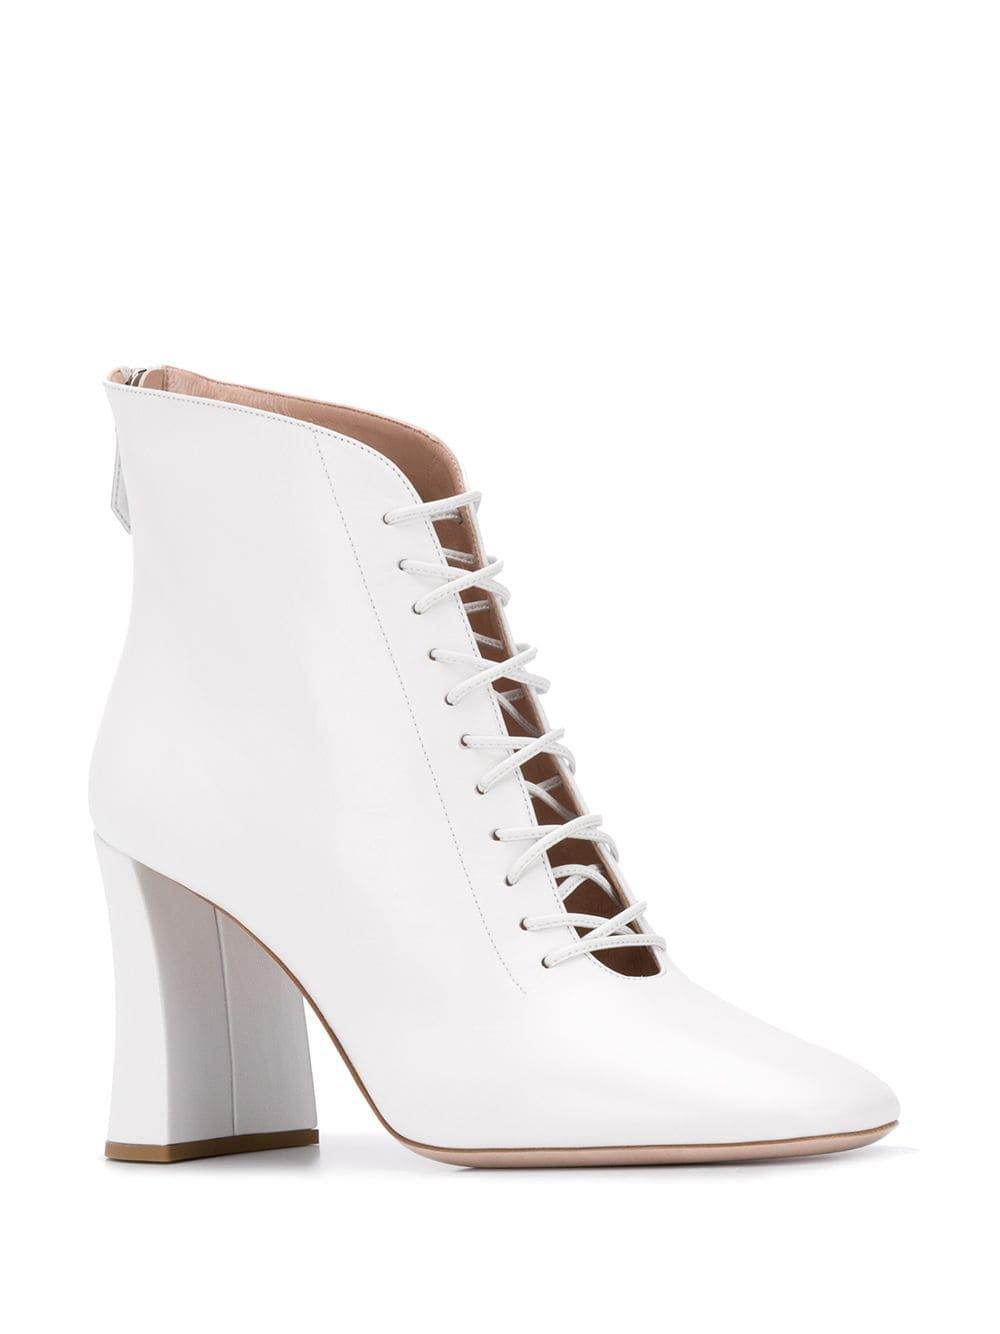 Miu Miu lace-up Detail Ankle Boots - Farfetch